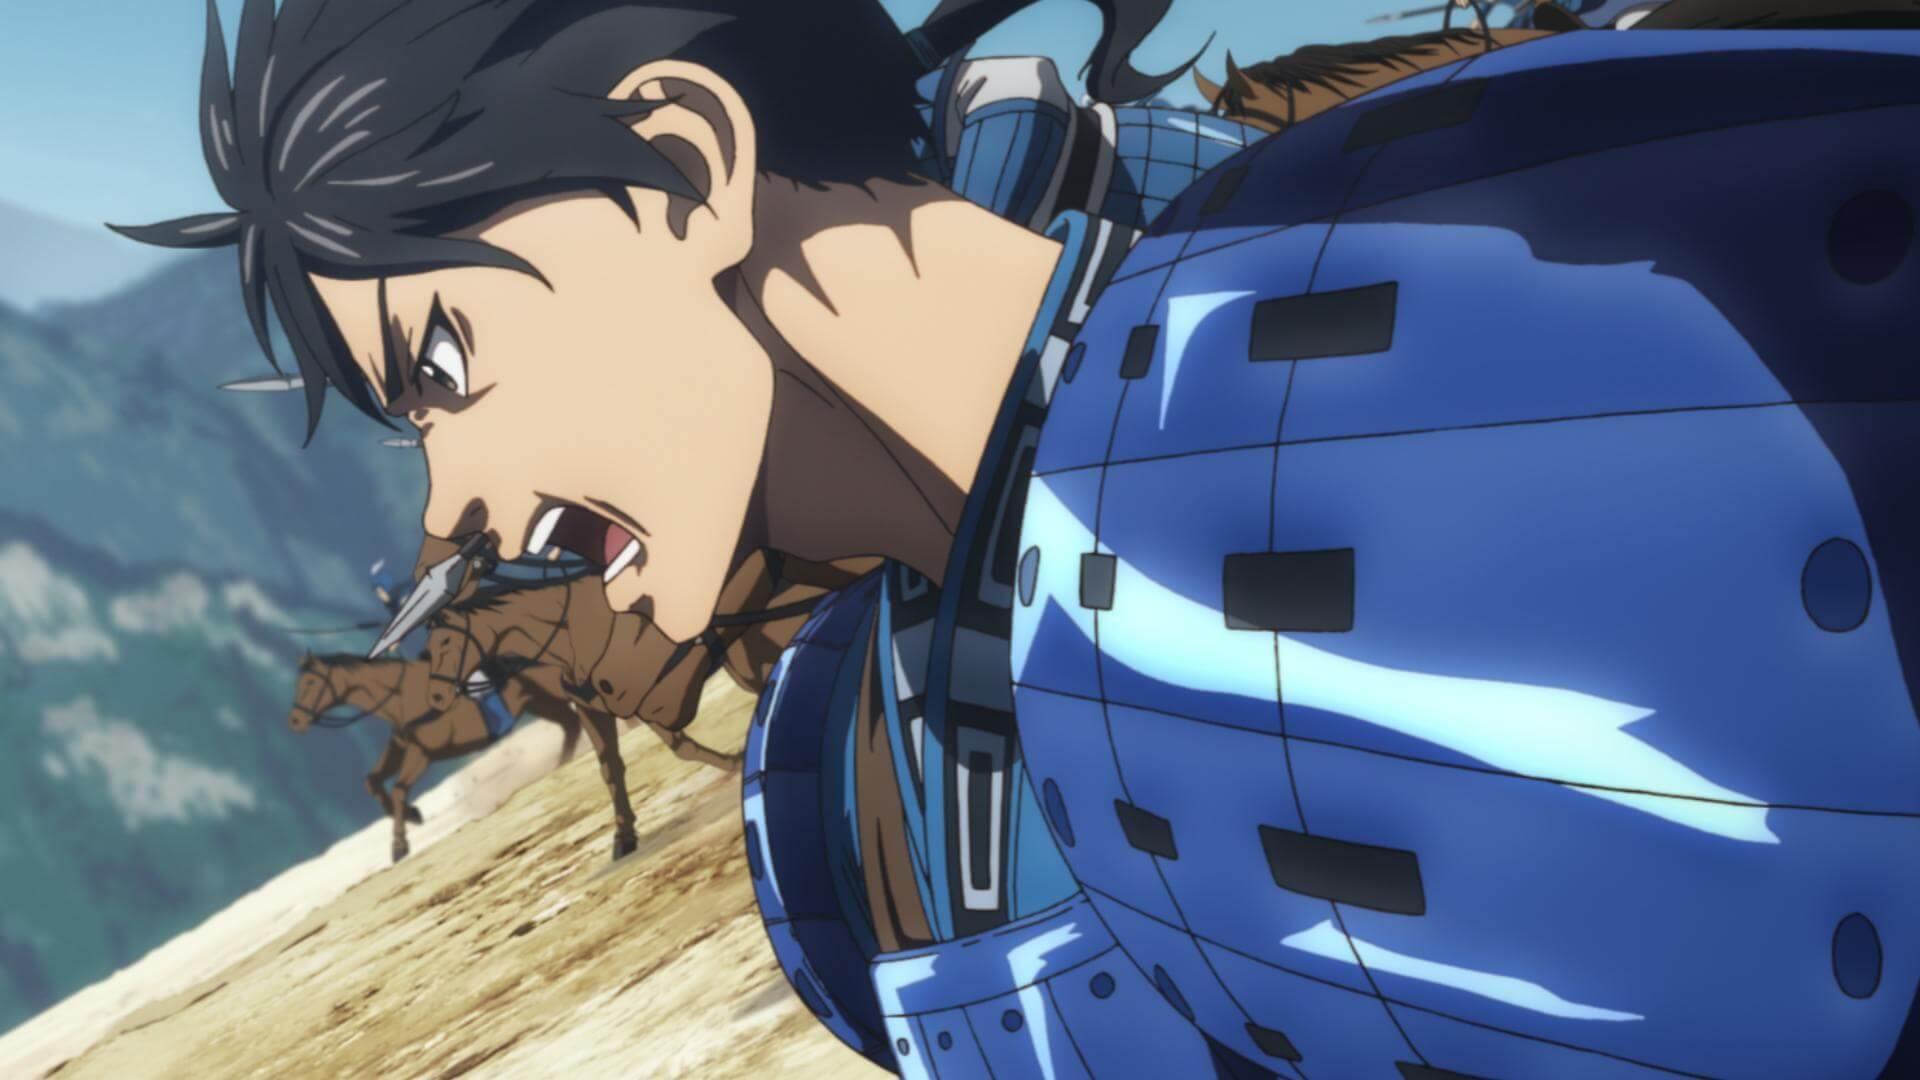 『SHAMAN KING』、『極主夫道』、『転スラ日記』など話題作目白押し!Netflix4月配信のアニメラインナップが解禁 art210326_netflix_anime_5